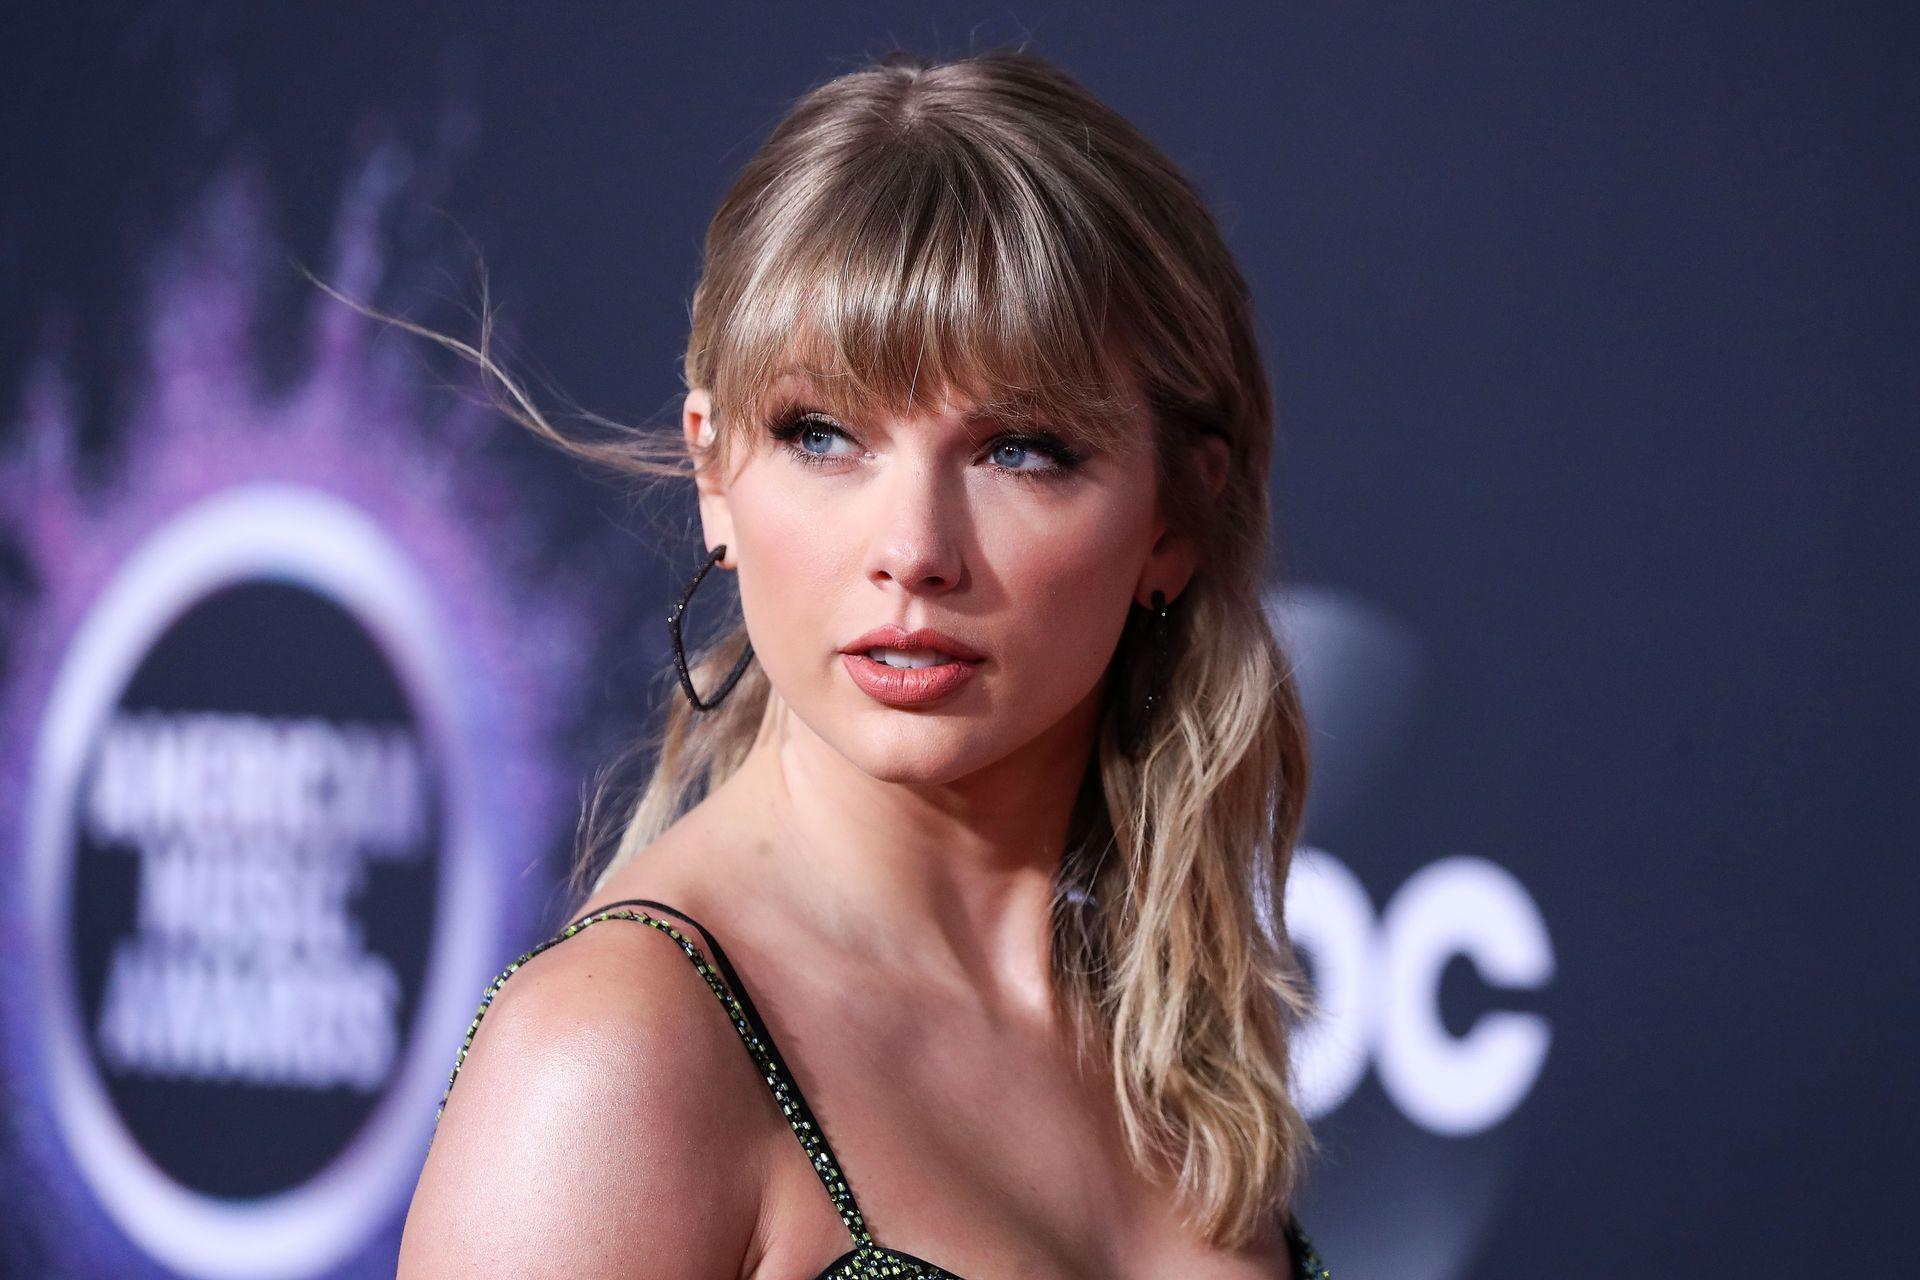 Taylor Swift Sexy 0104